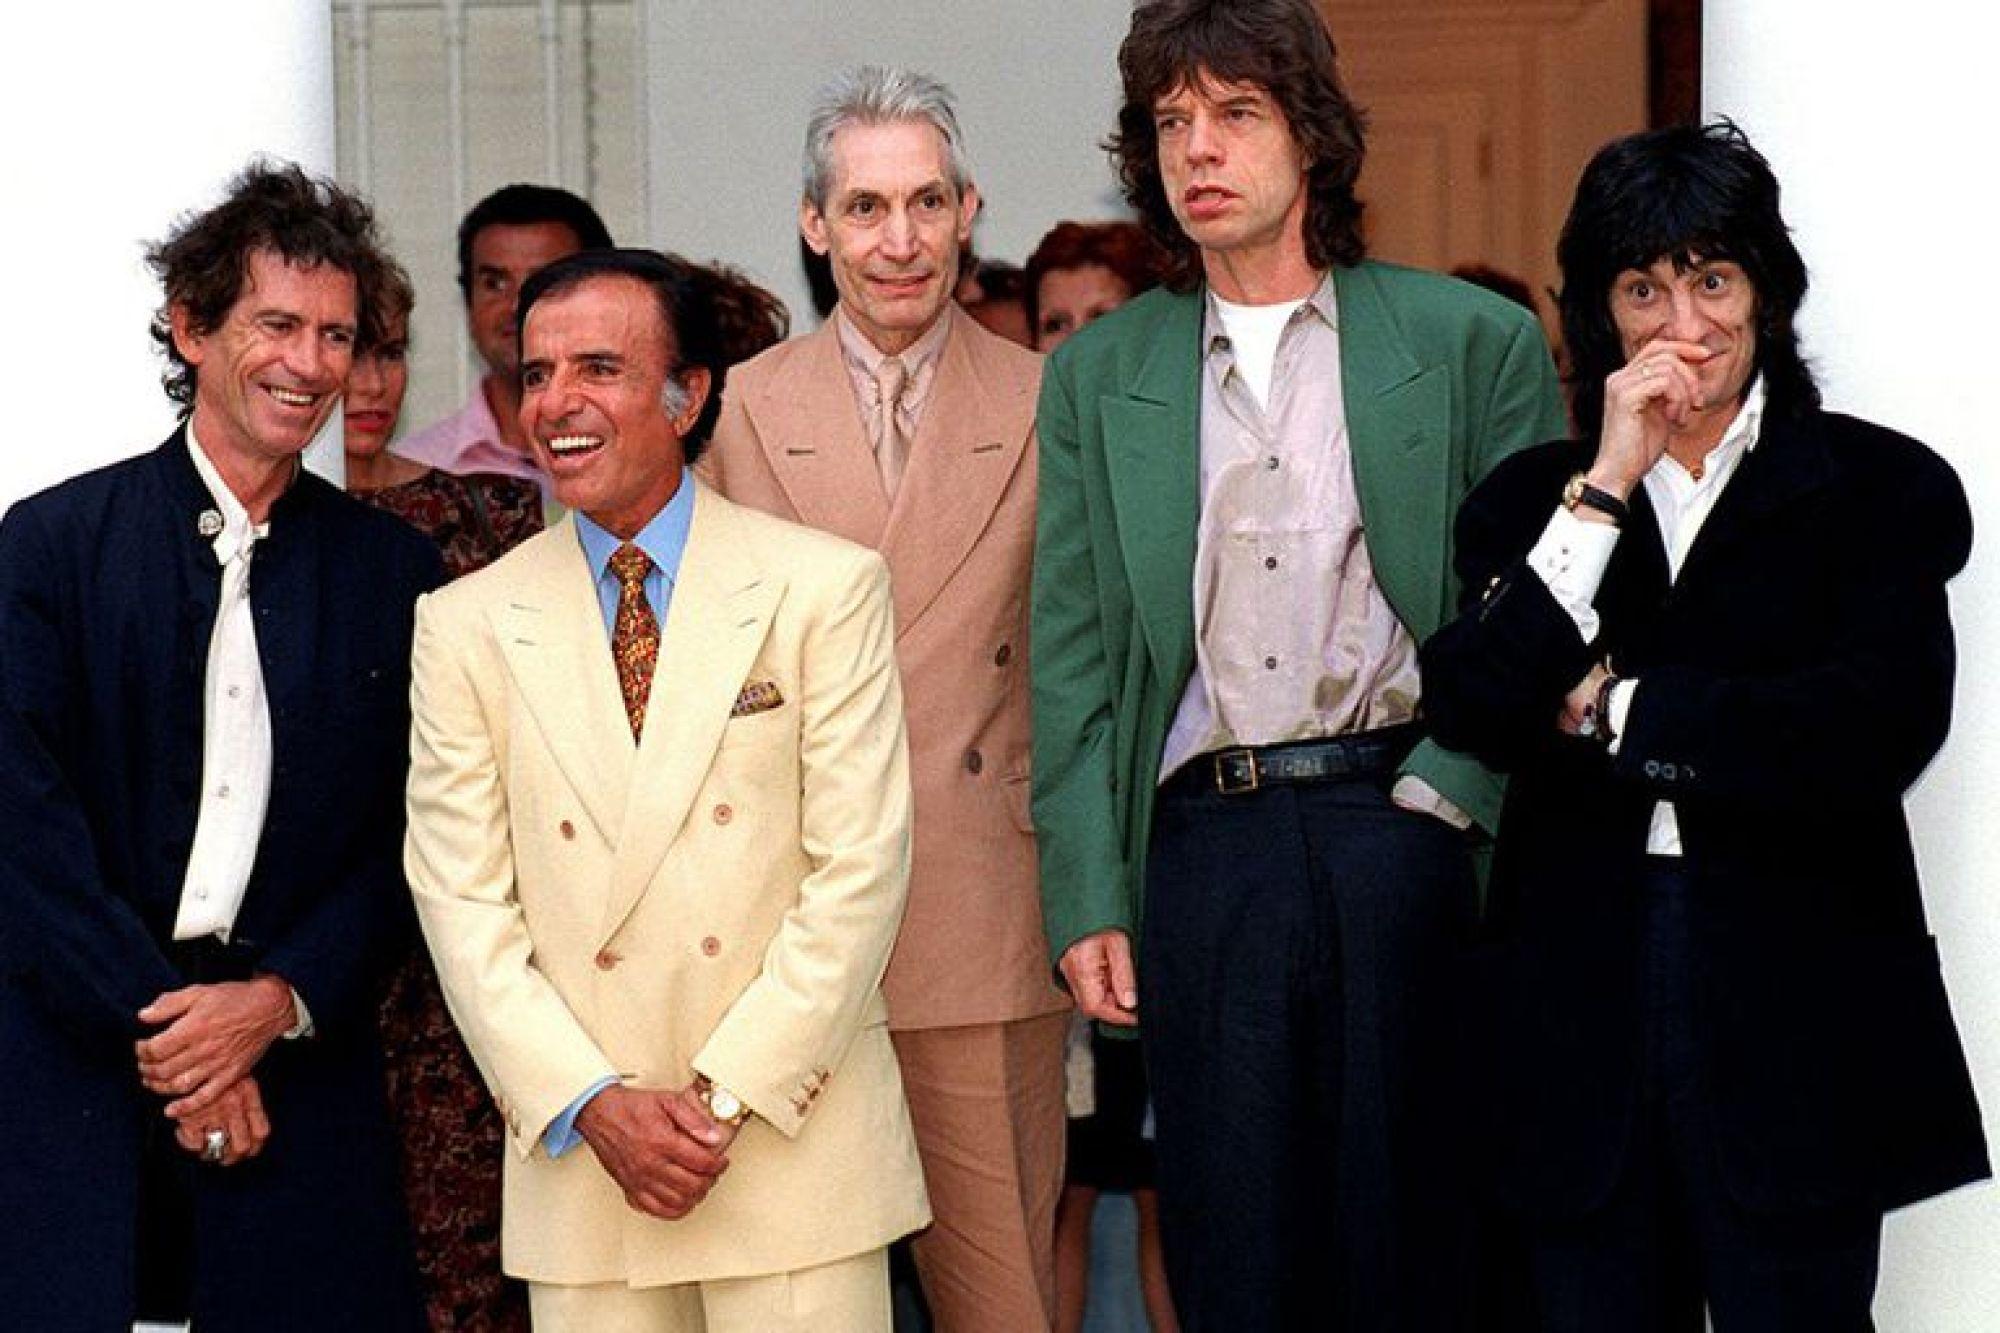 Menem junto a la banda Rolling Stones en la quinta de Olivos, el 10 de febrero de 1995